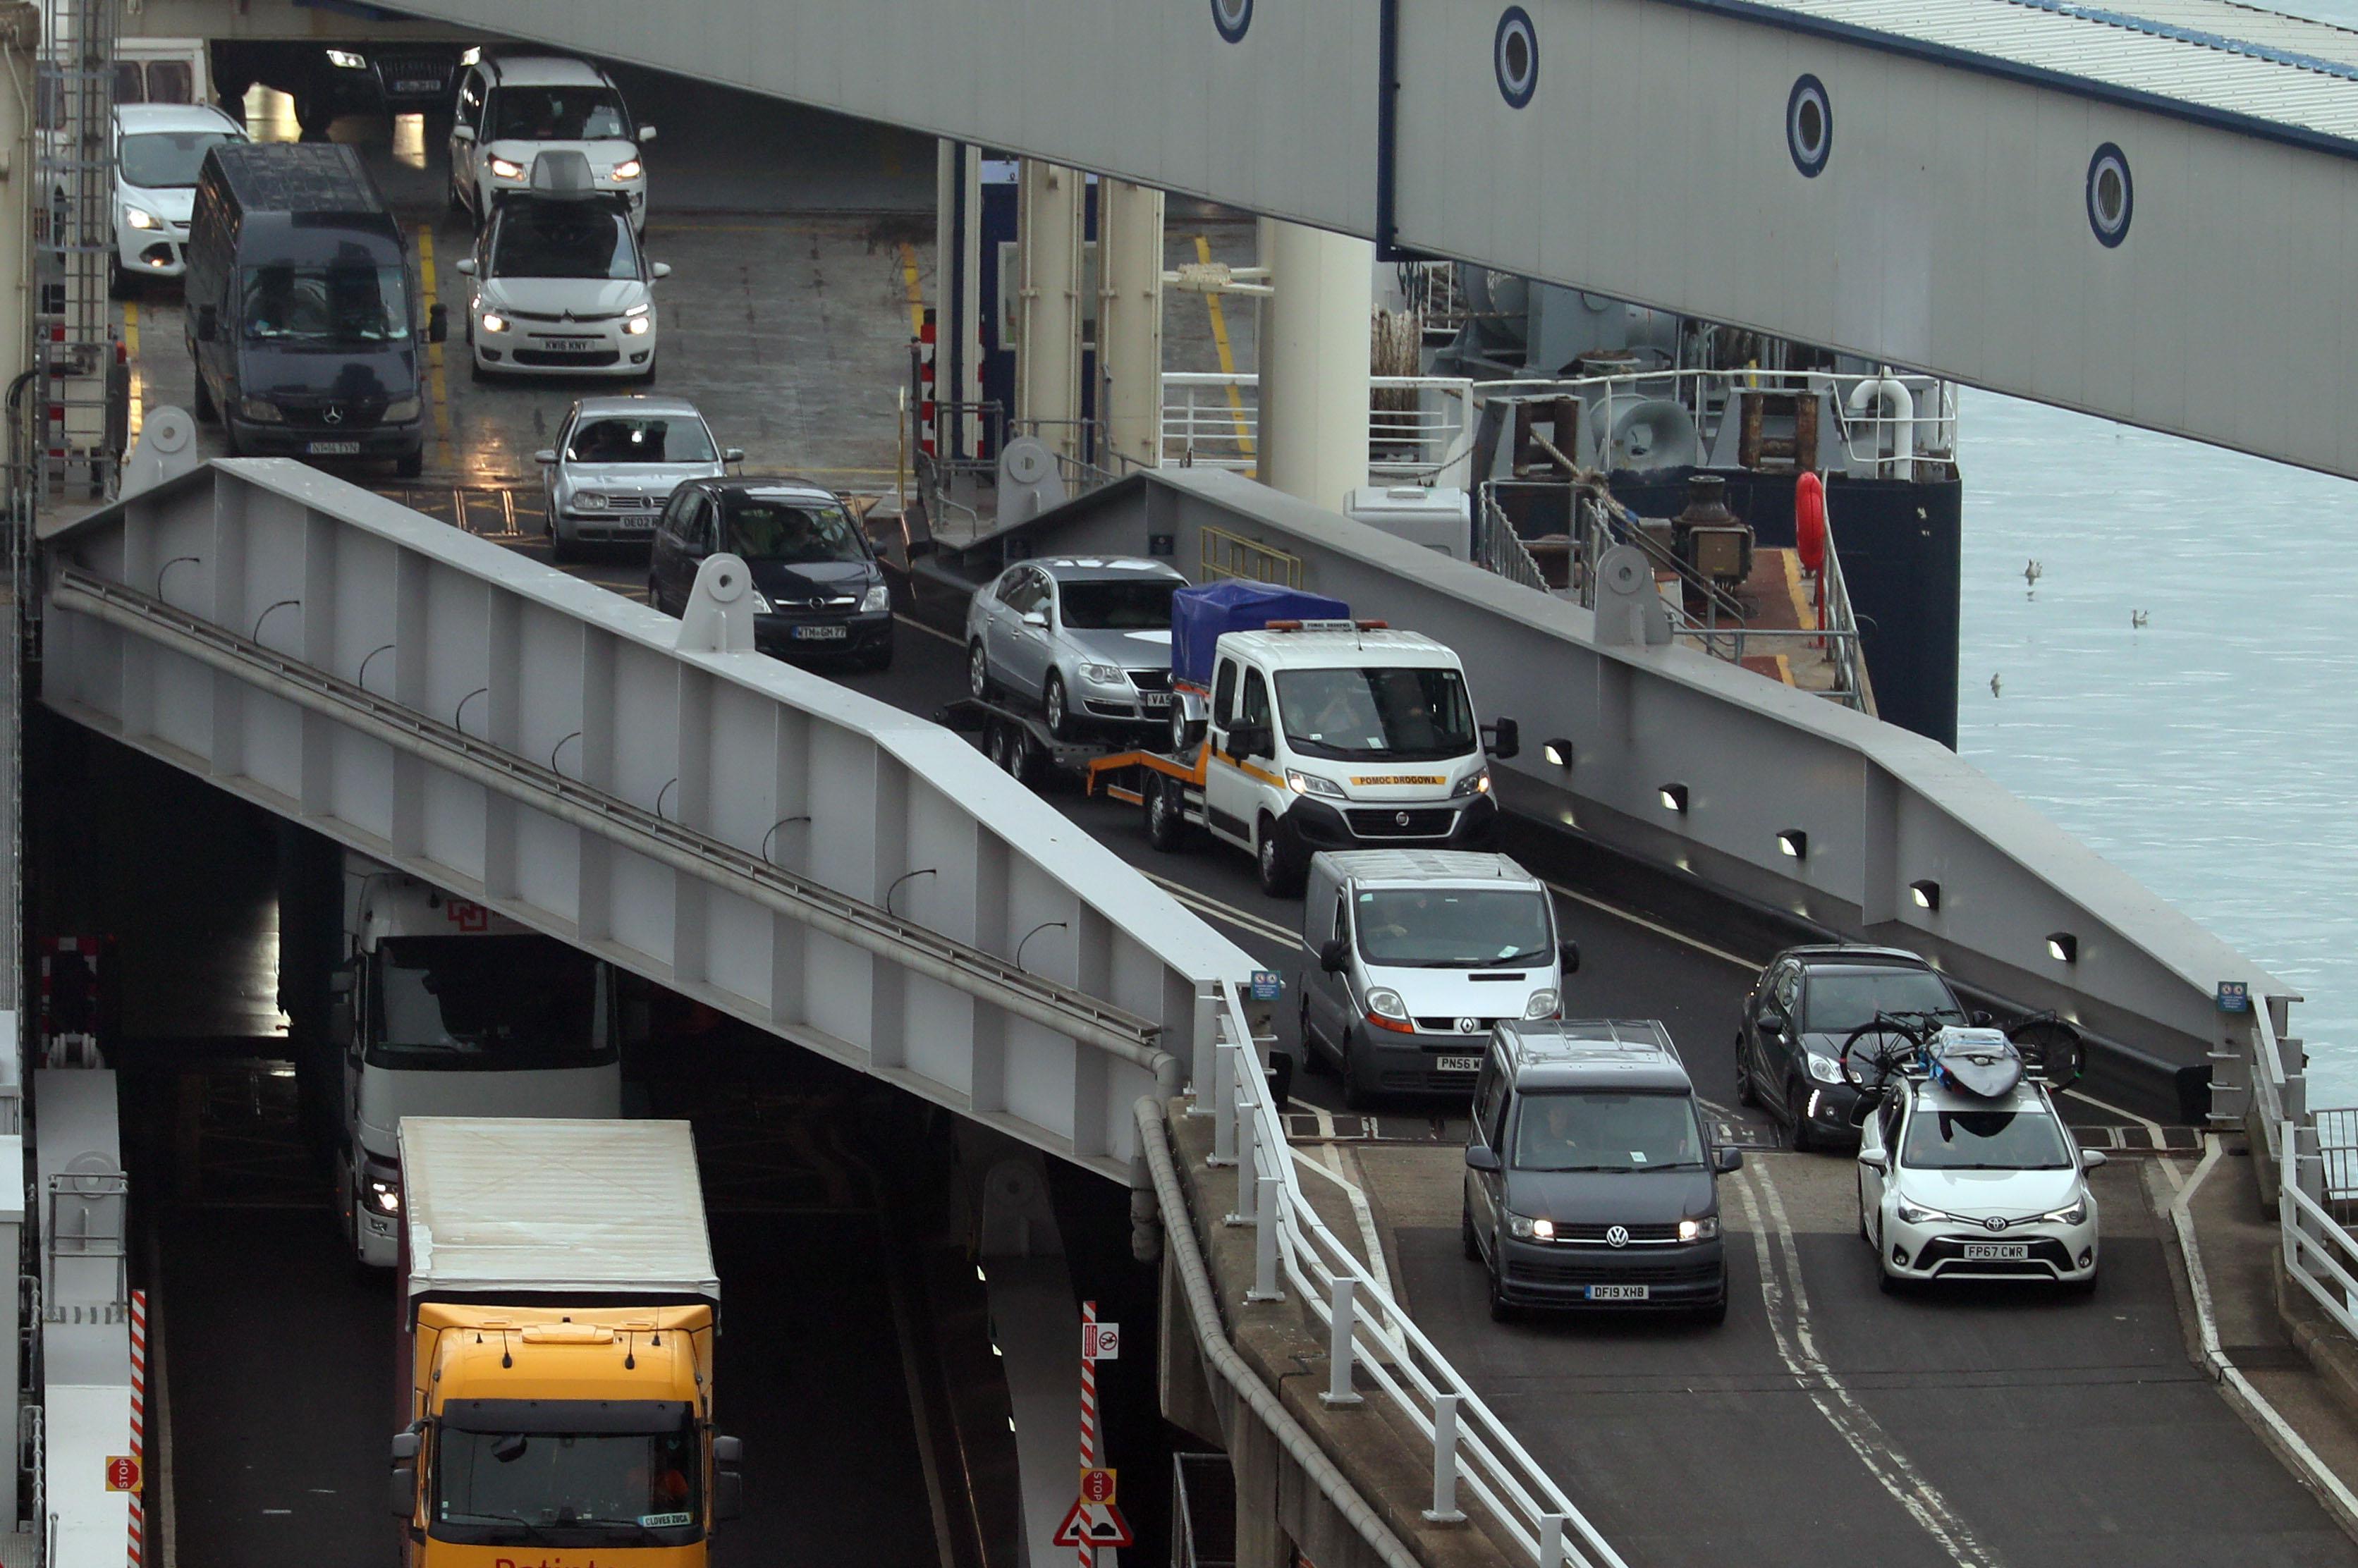 Thousands return to United Kingdom to beat France quarantine